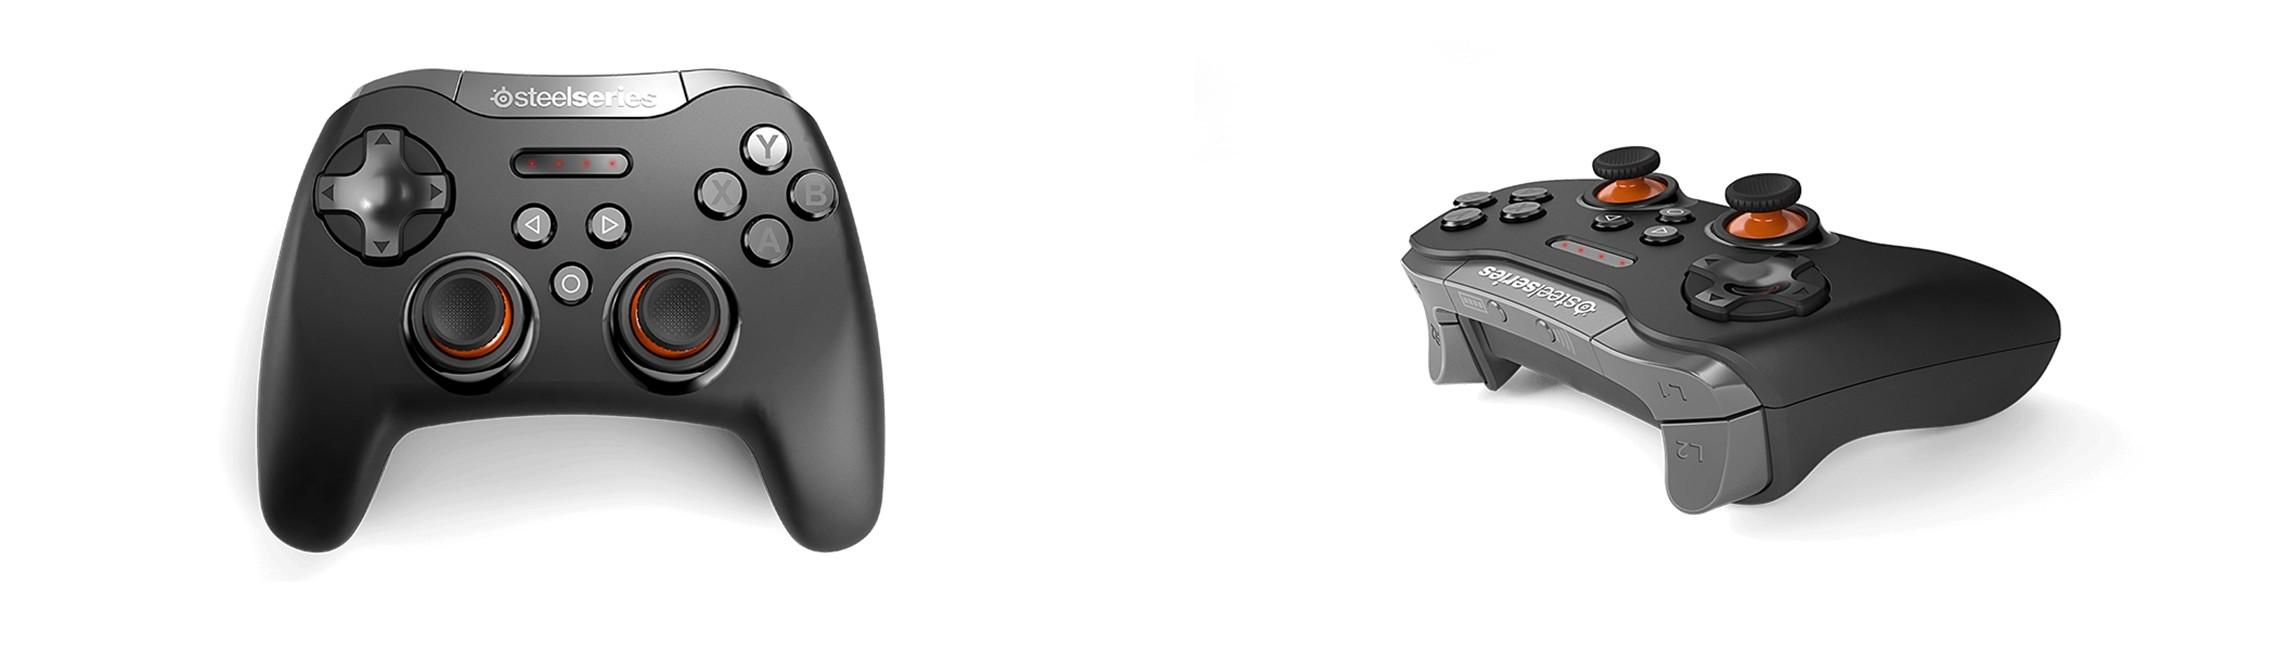 Android uyumlu bilgisayar kolu Stratus XL